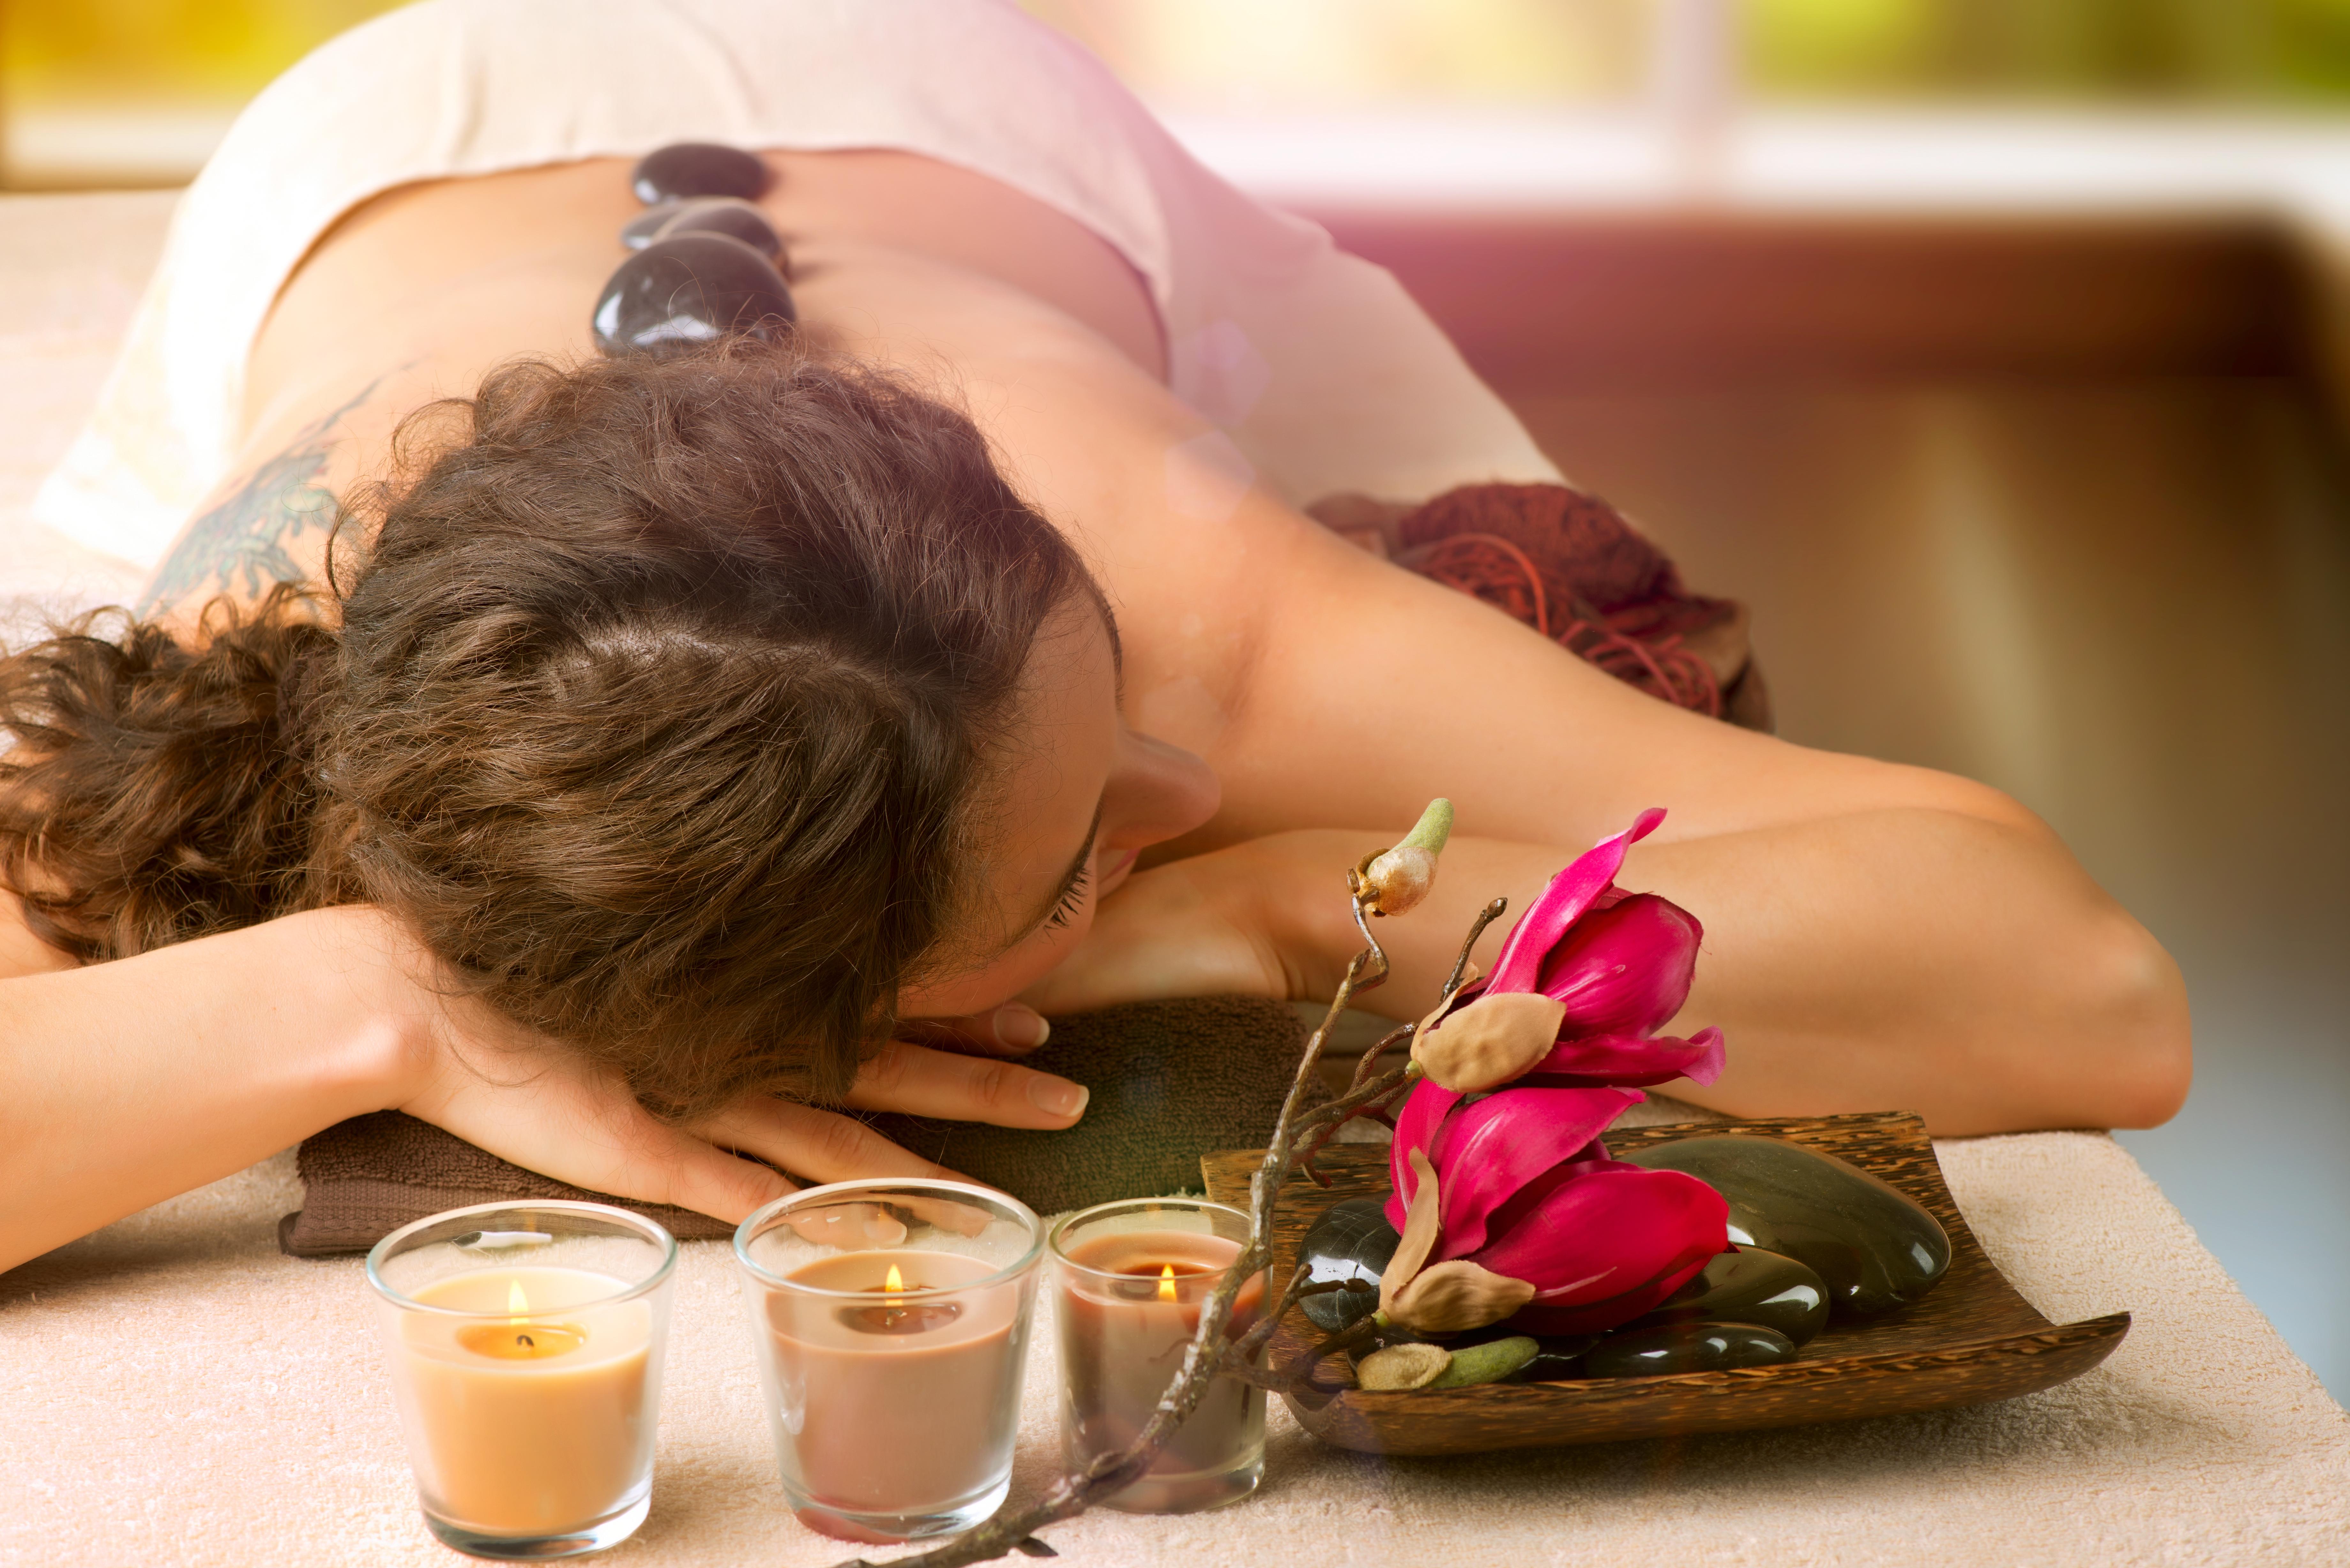 Dia da Noiva: relaxe os nervos antes do grande momento